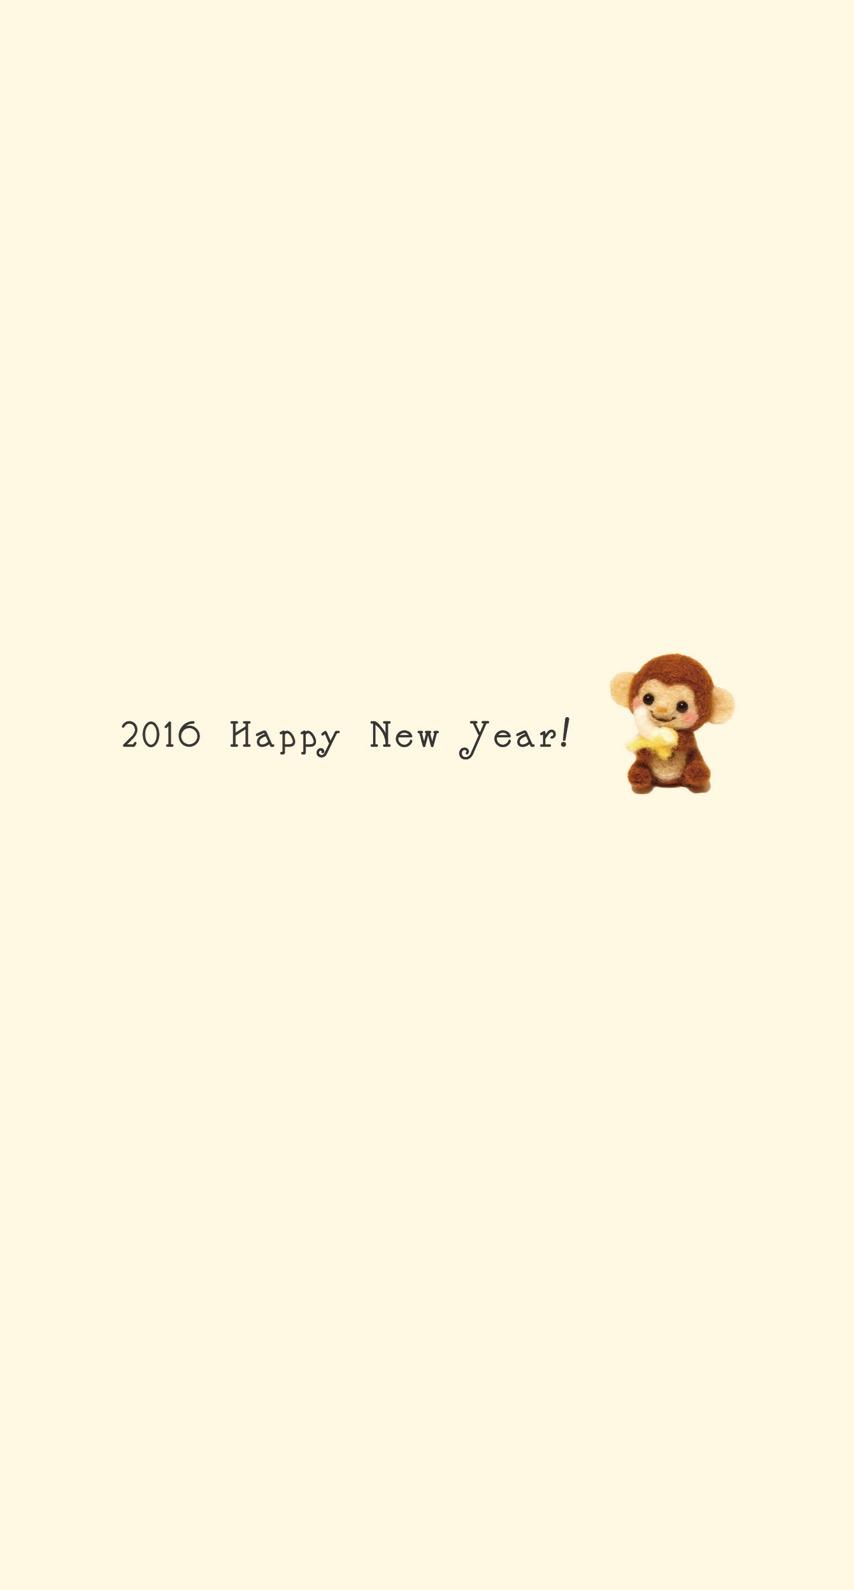 monkey happy news year 2016 yellow wallpaper  wallpaper.sc